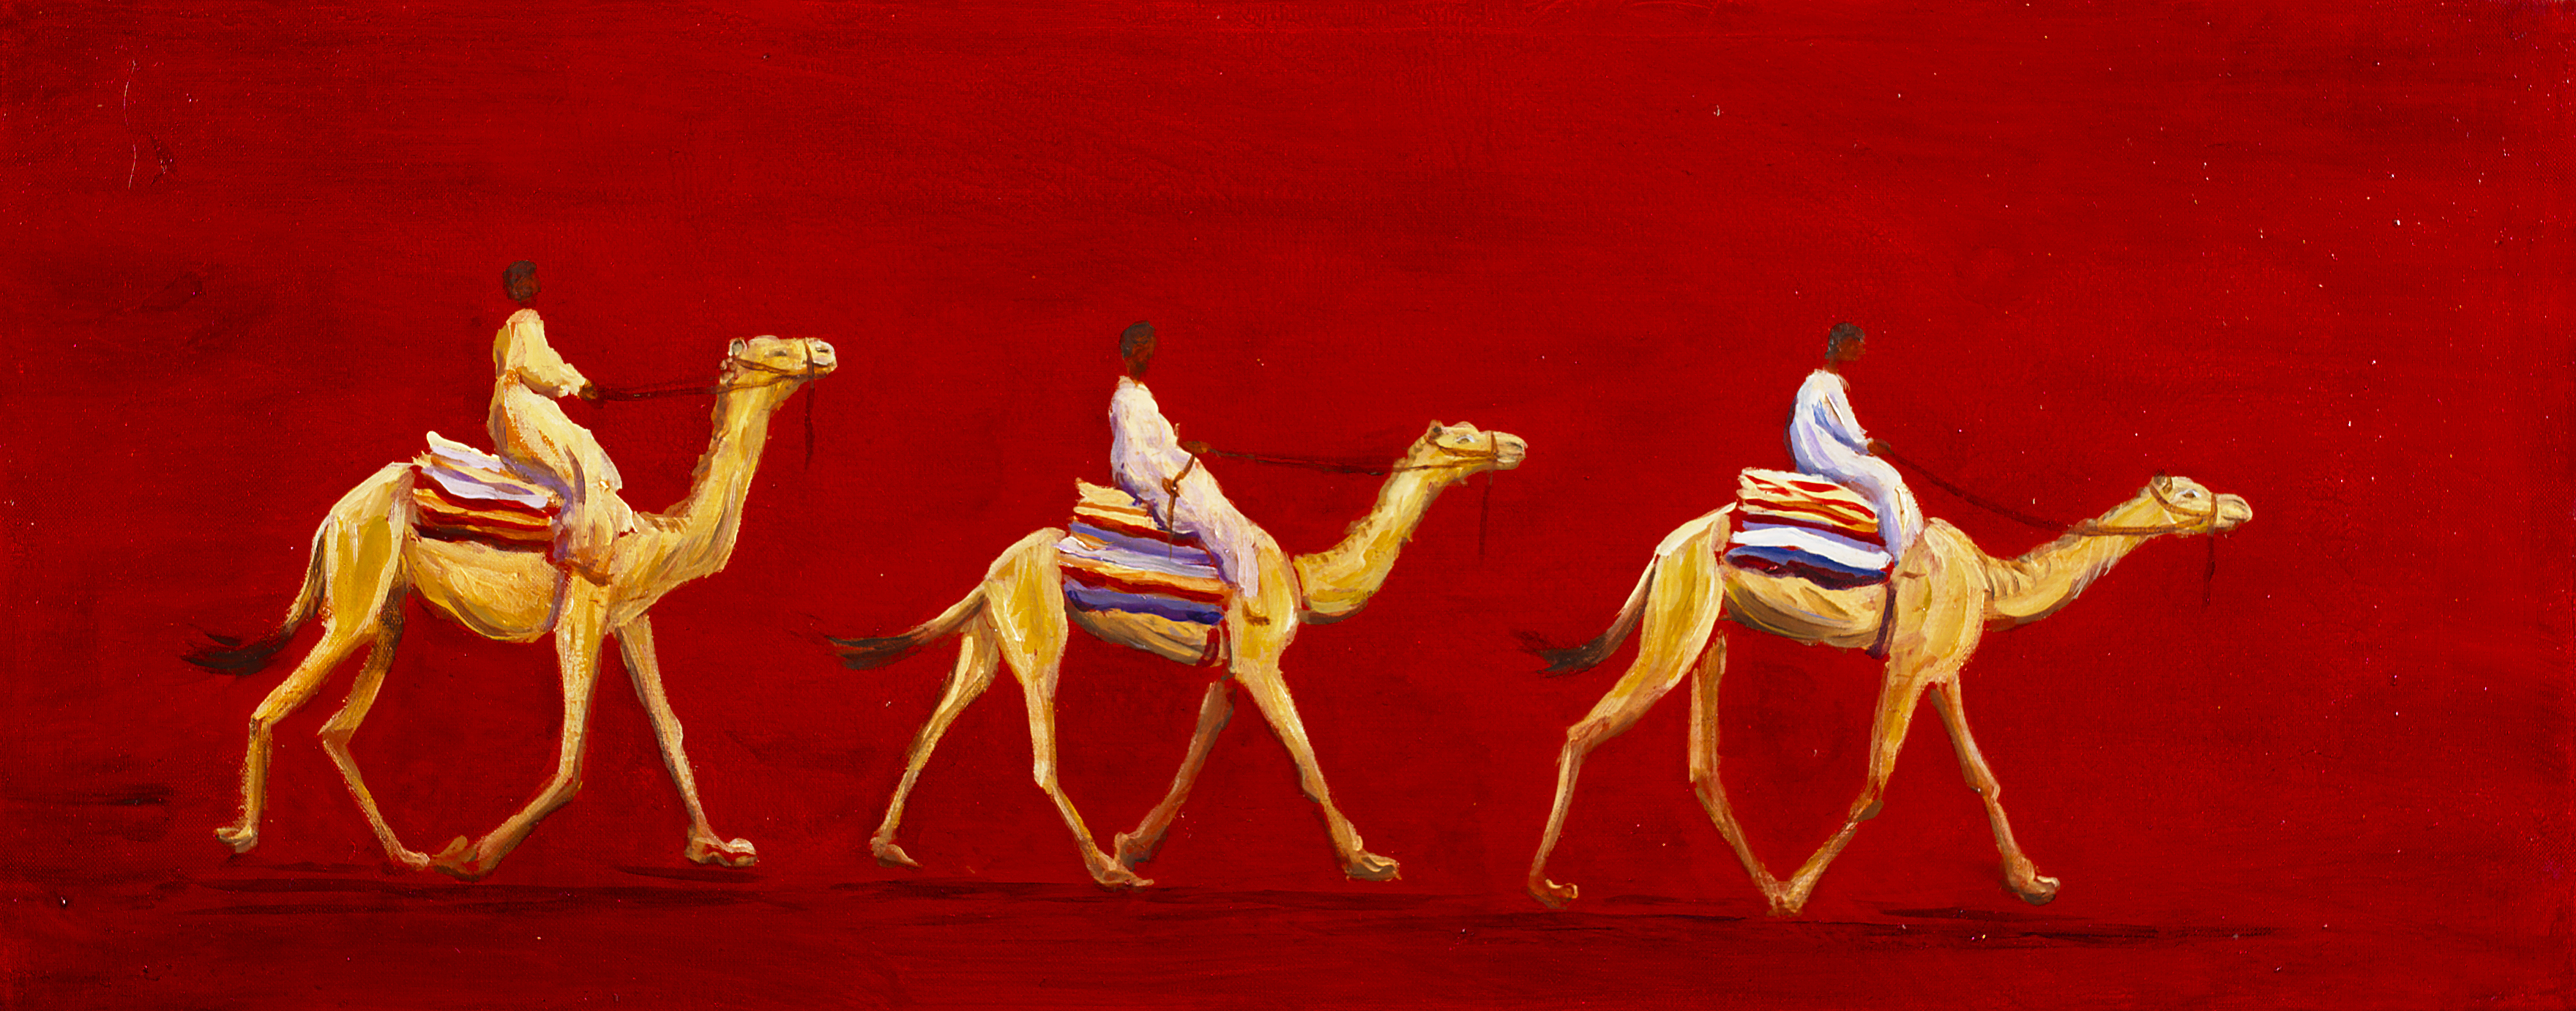 Camelcade